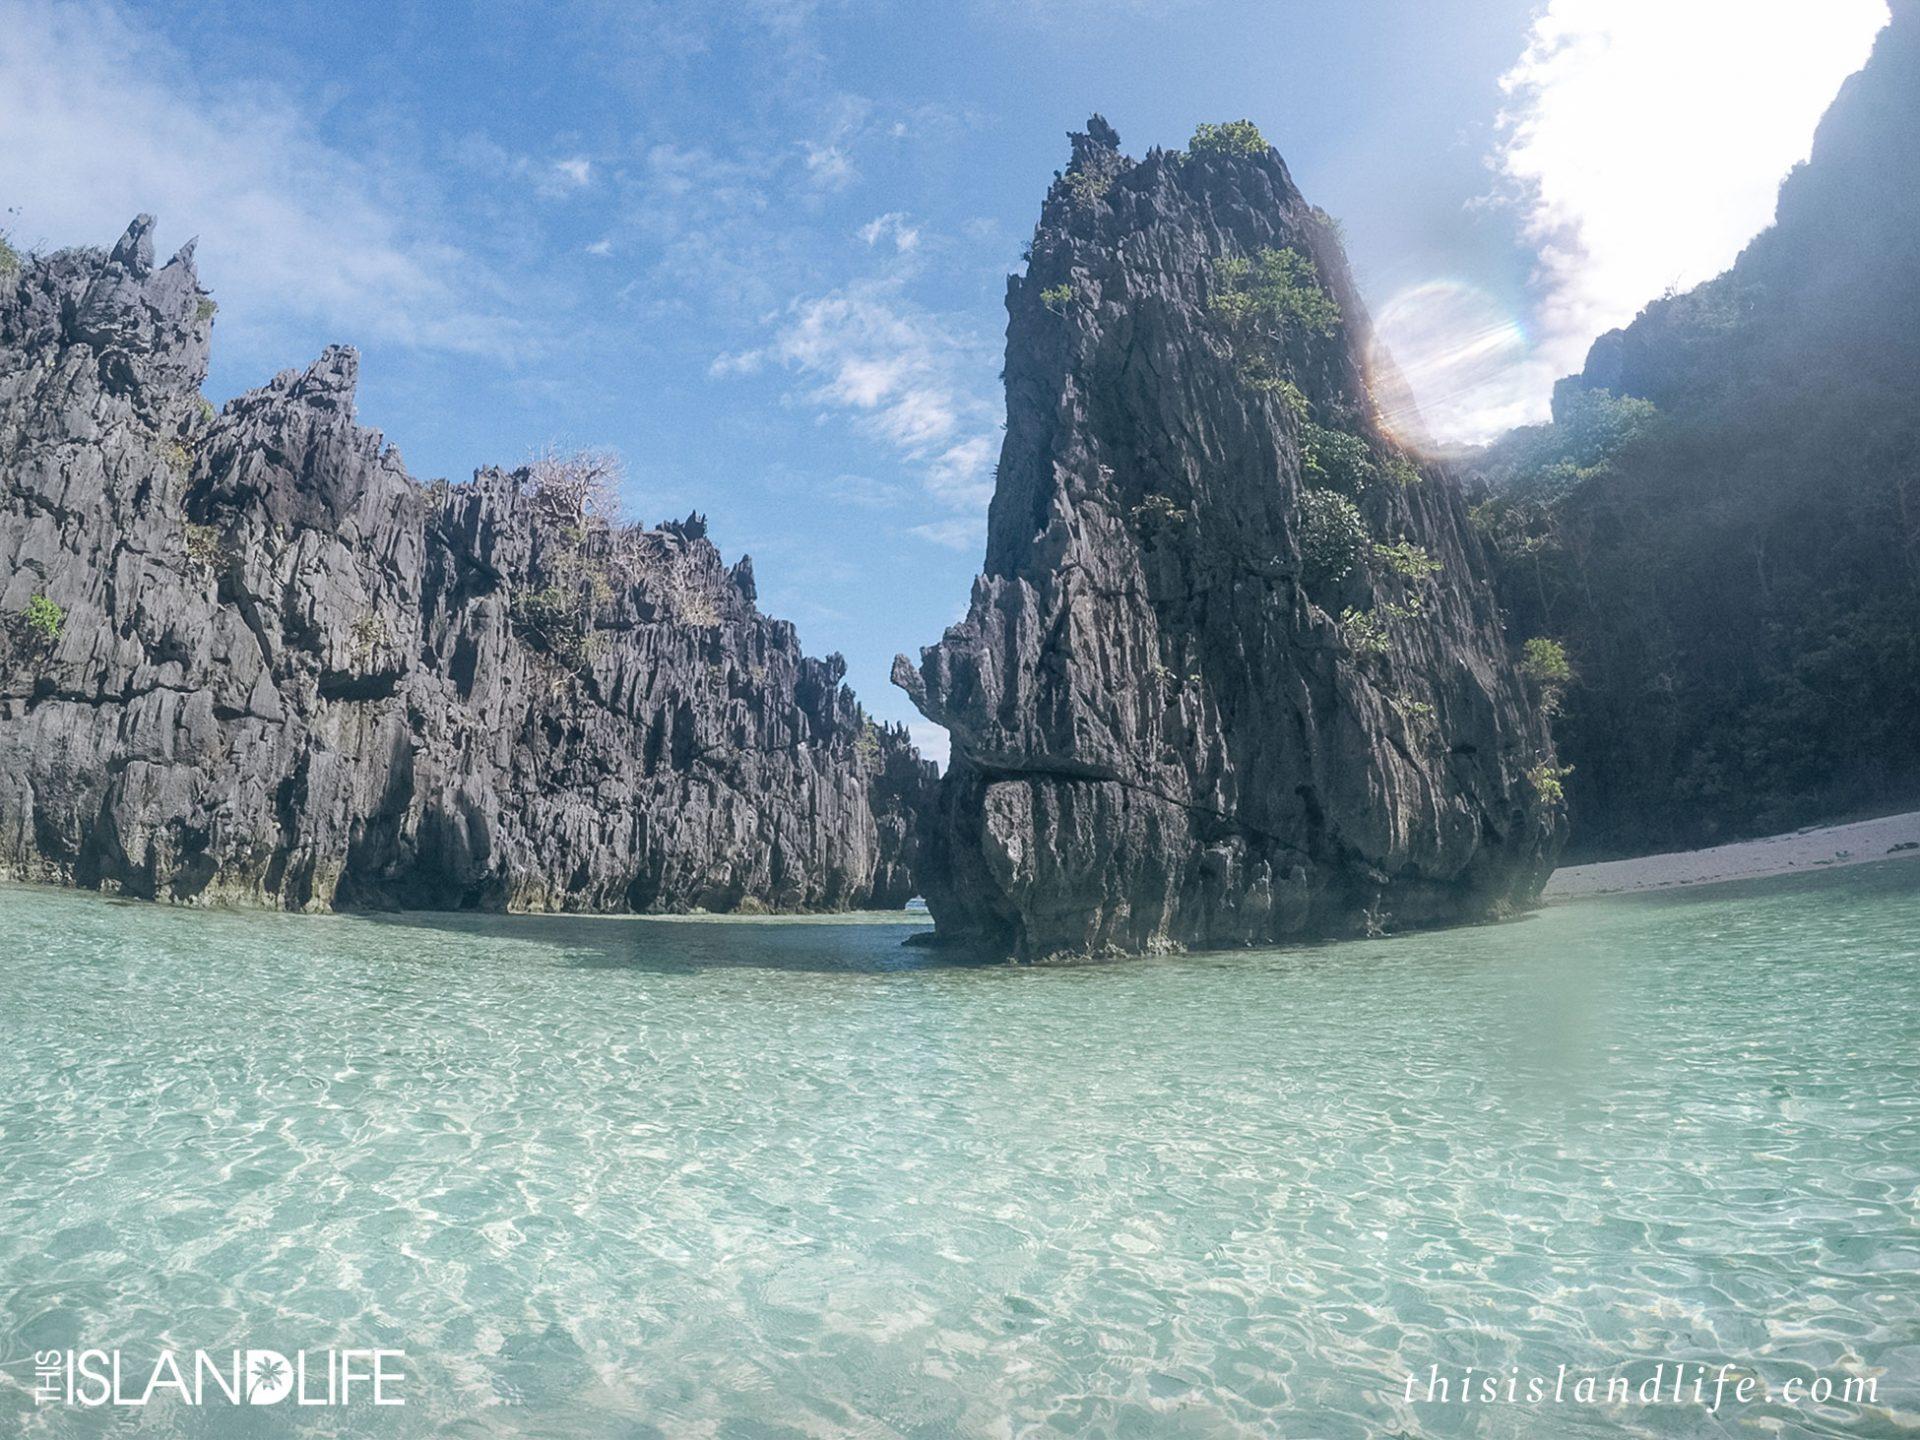 This-Island-Life-El-Nido-Palawan-Island-Philippines-wm-41